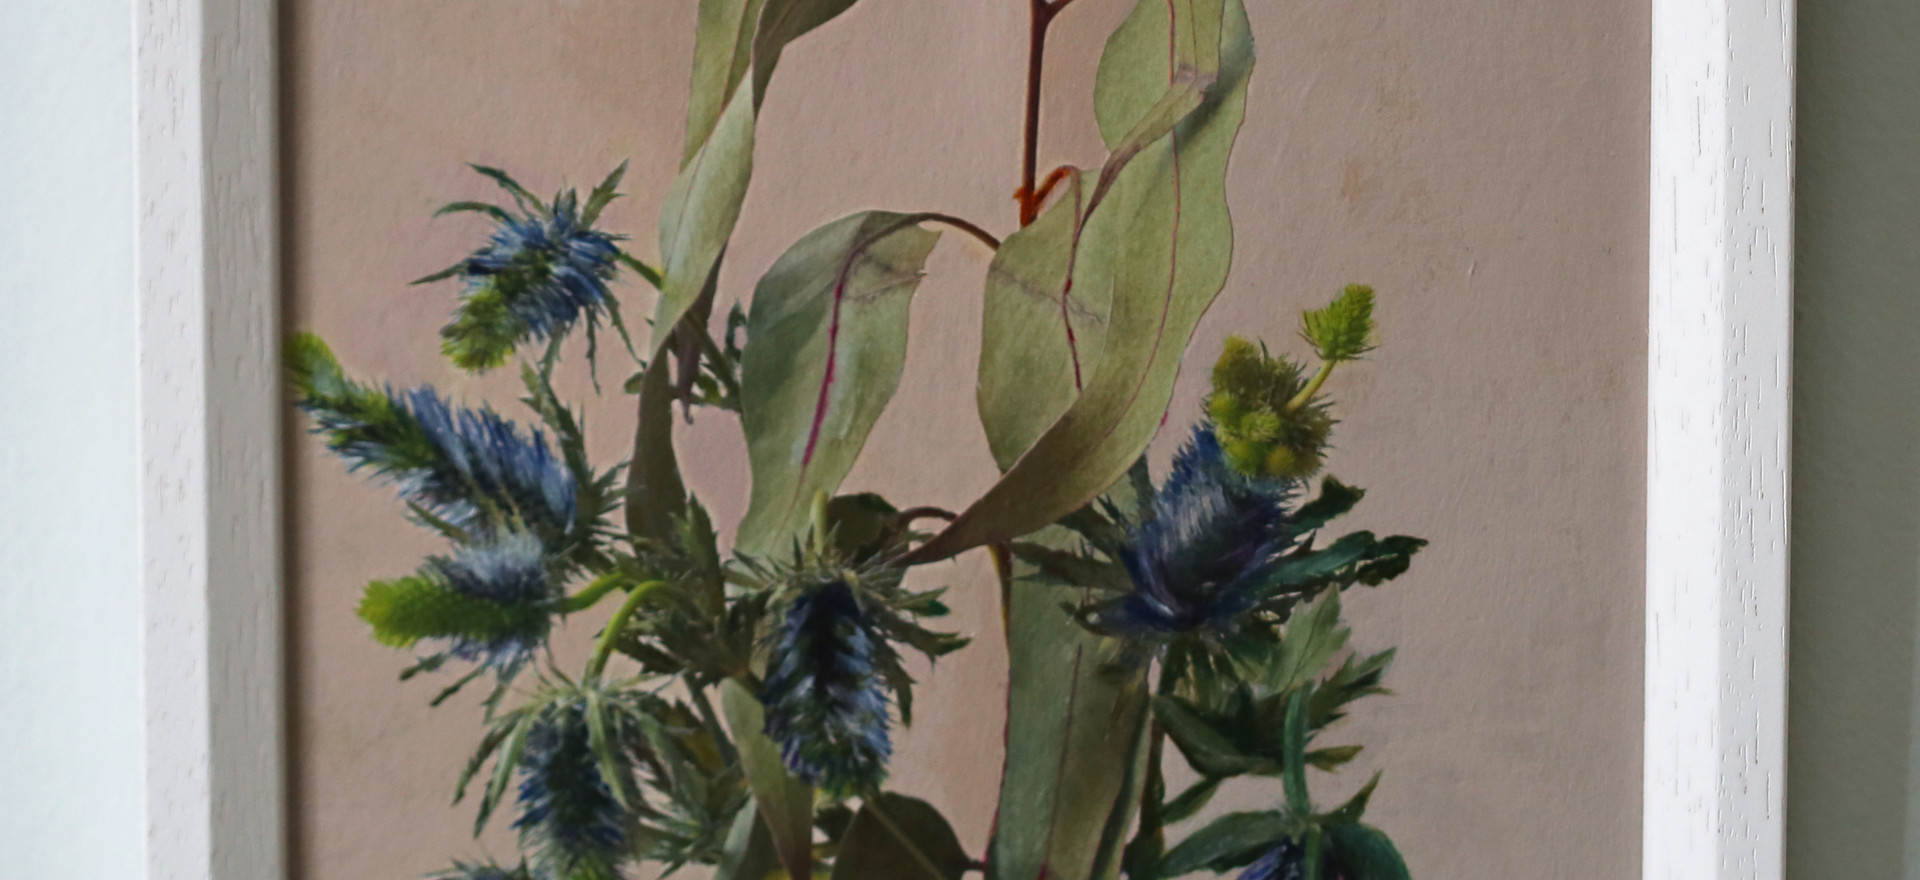 Eucalyptus and Eryngium